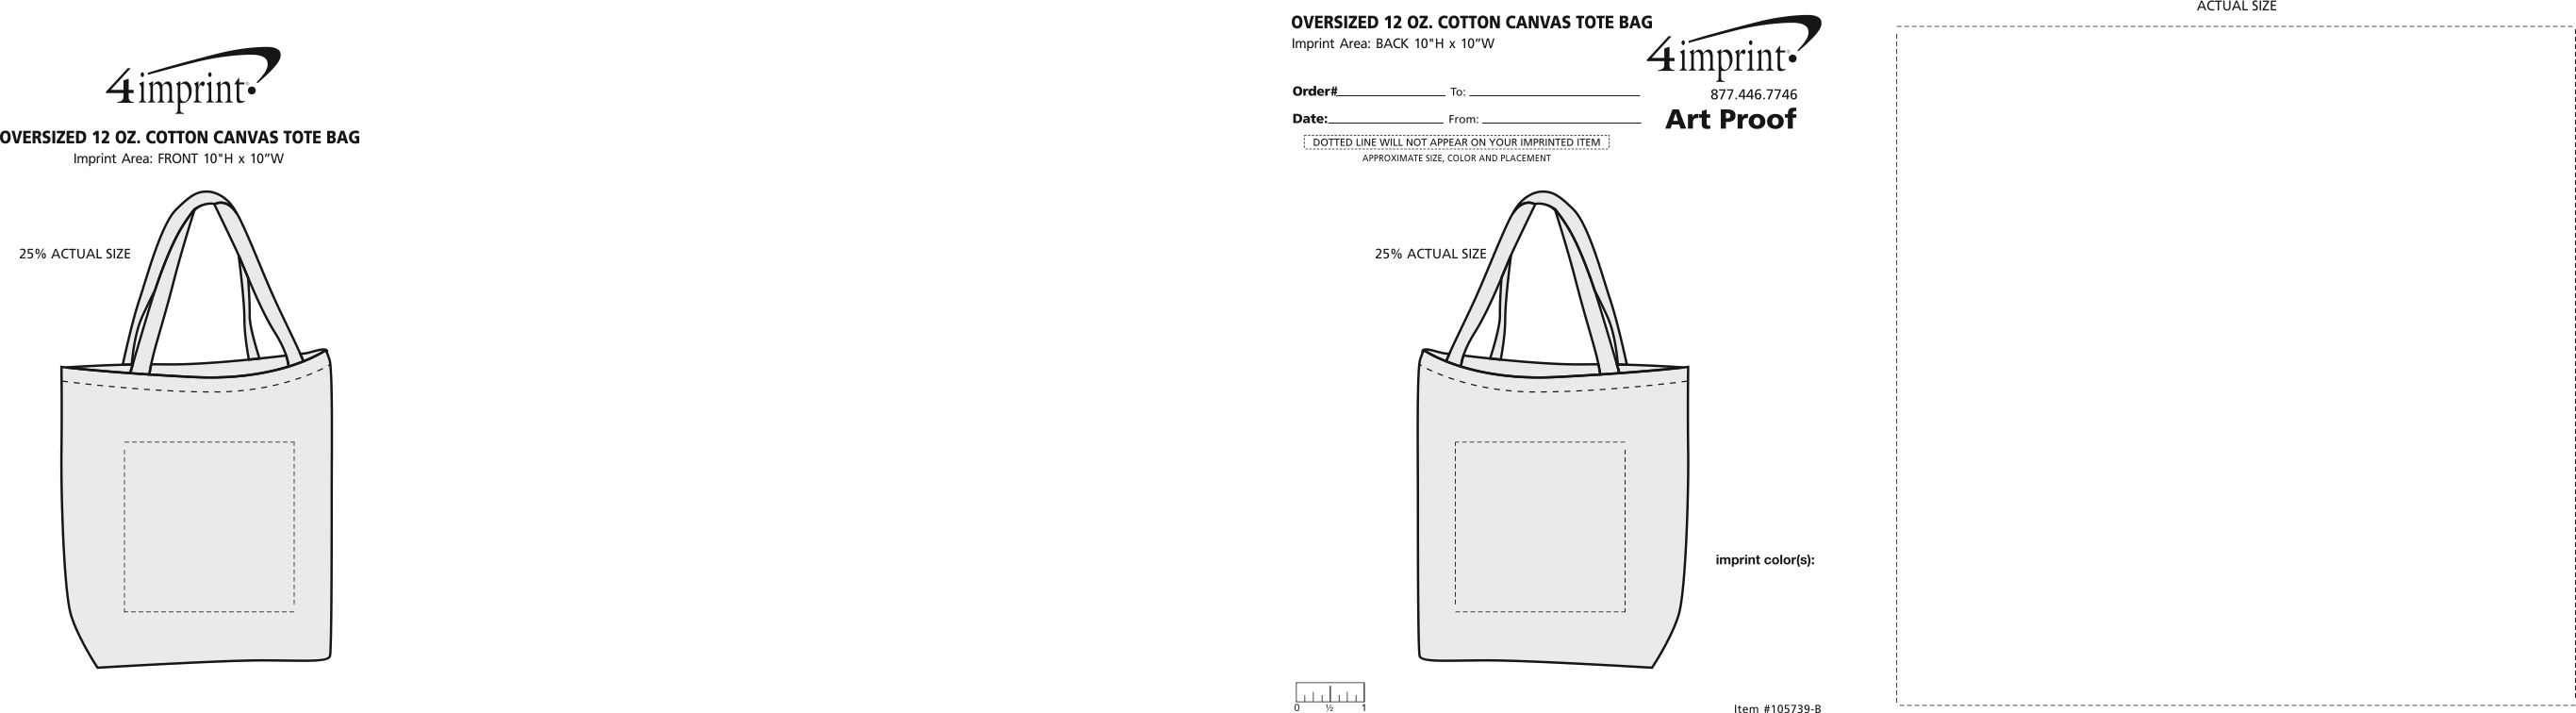 Imprint Area of Oversized 12 oz. Cotton Canvas Tote Bag - Black